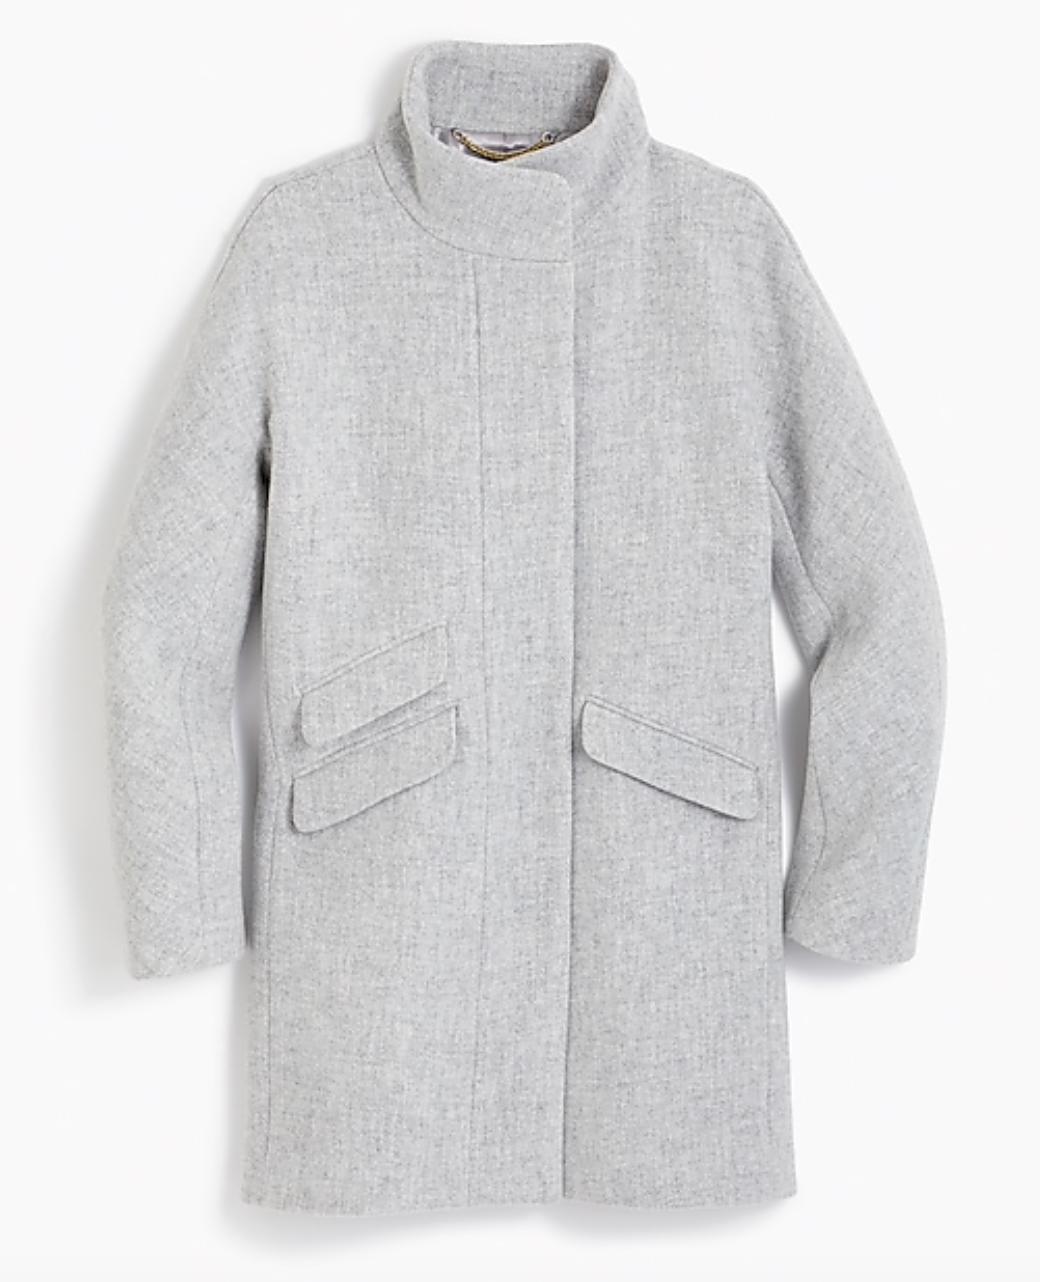 J.Crew: Cocoon Coat